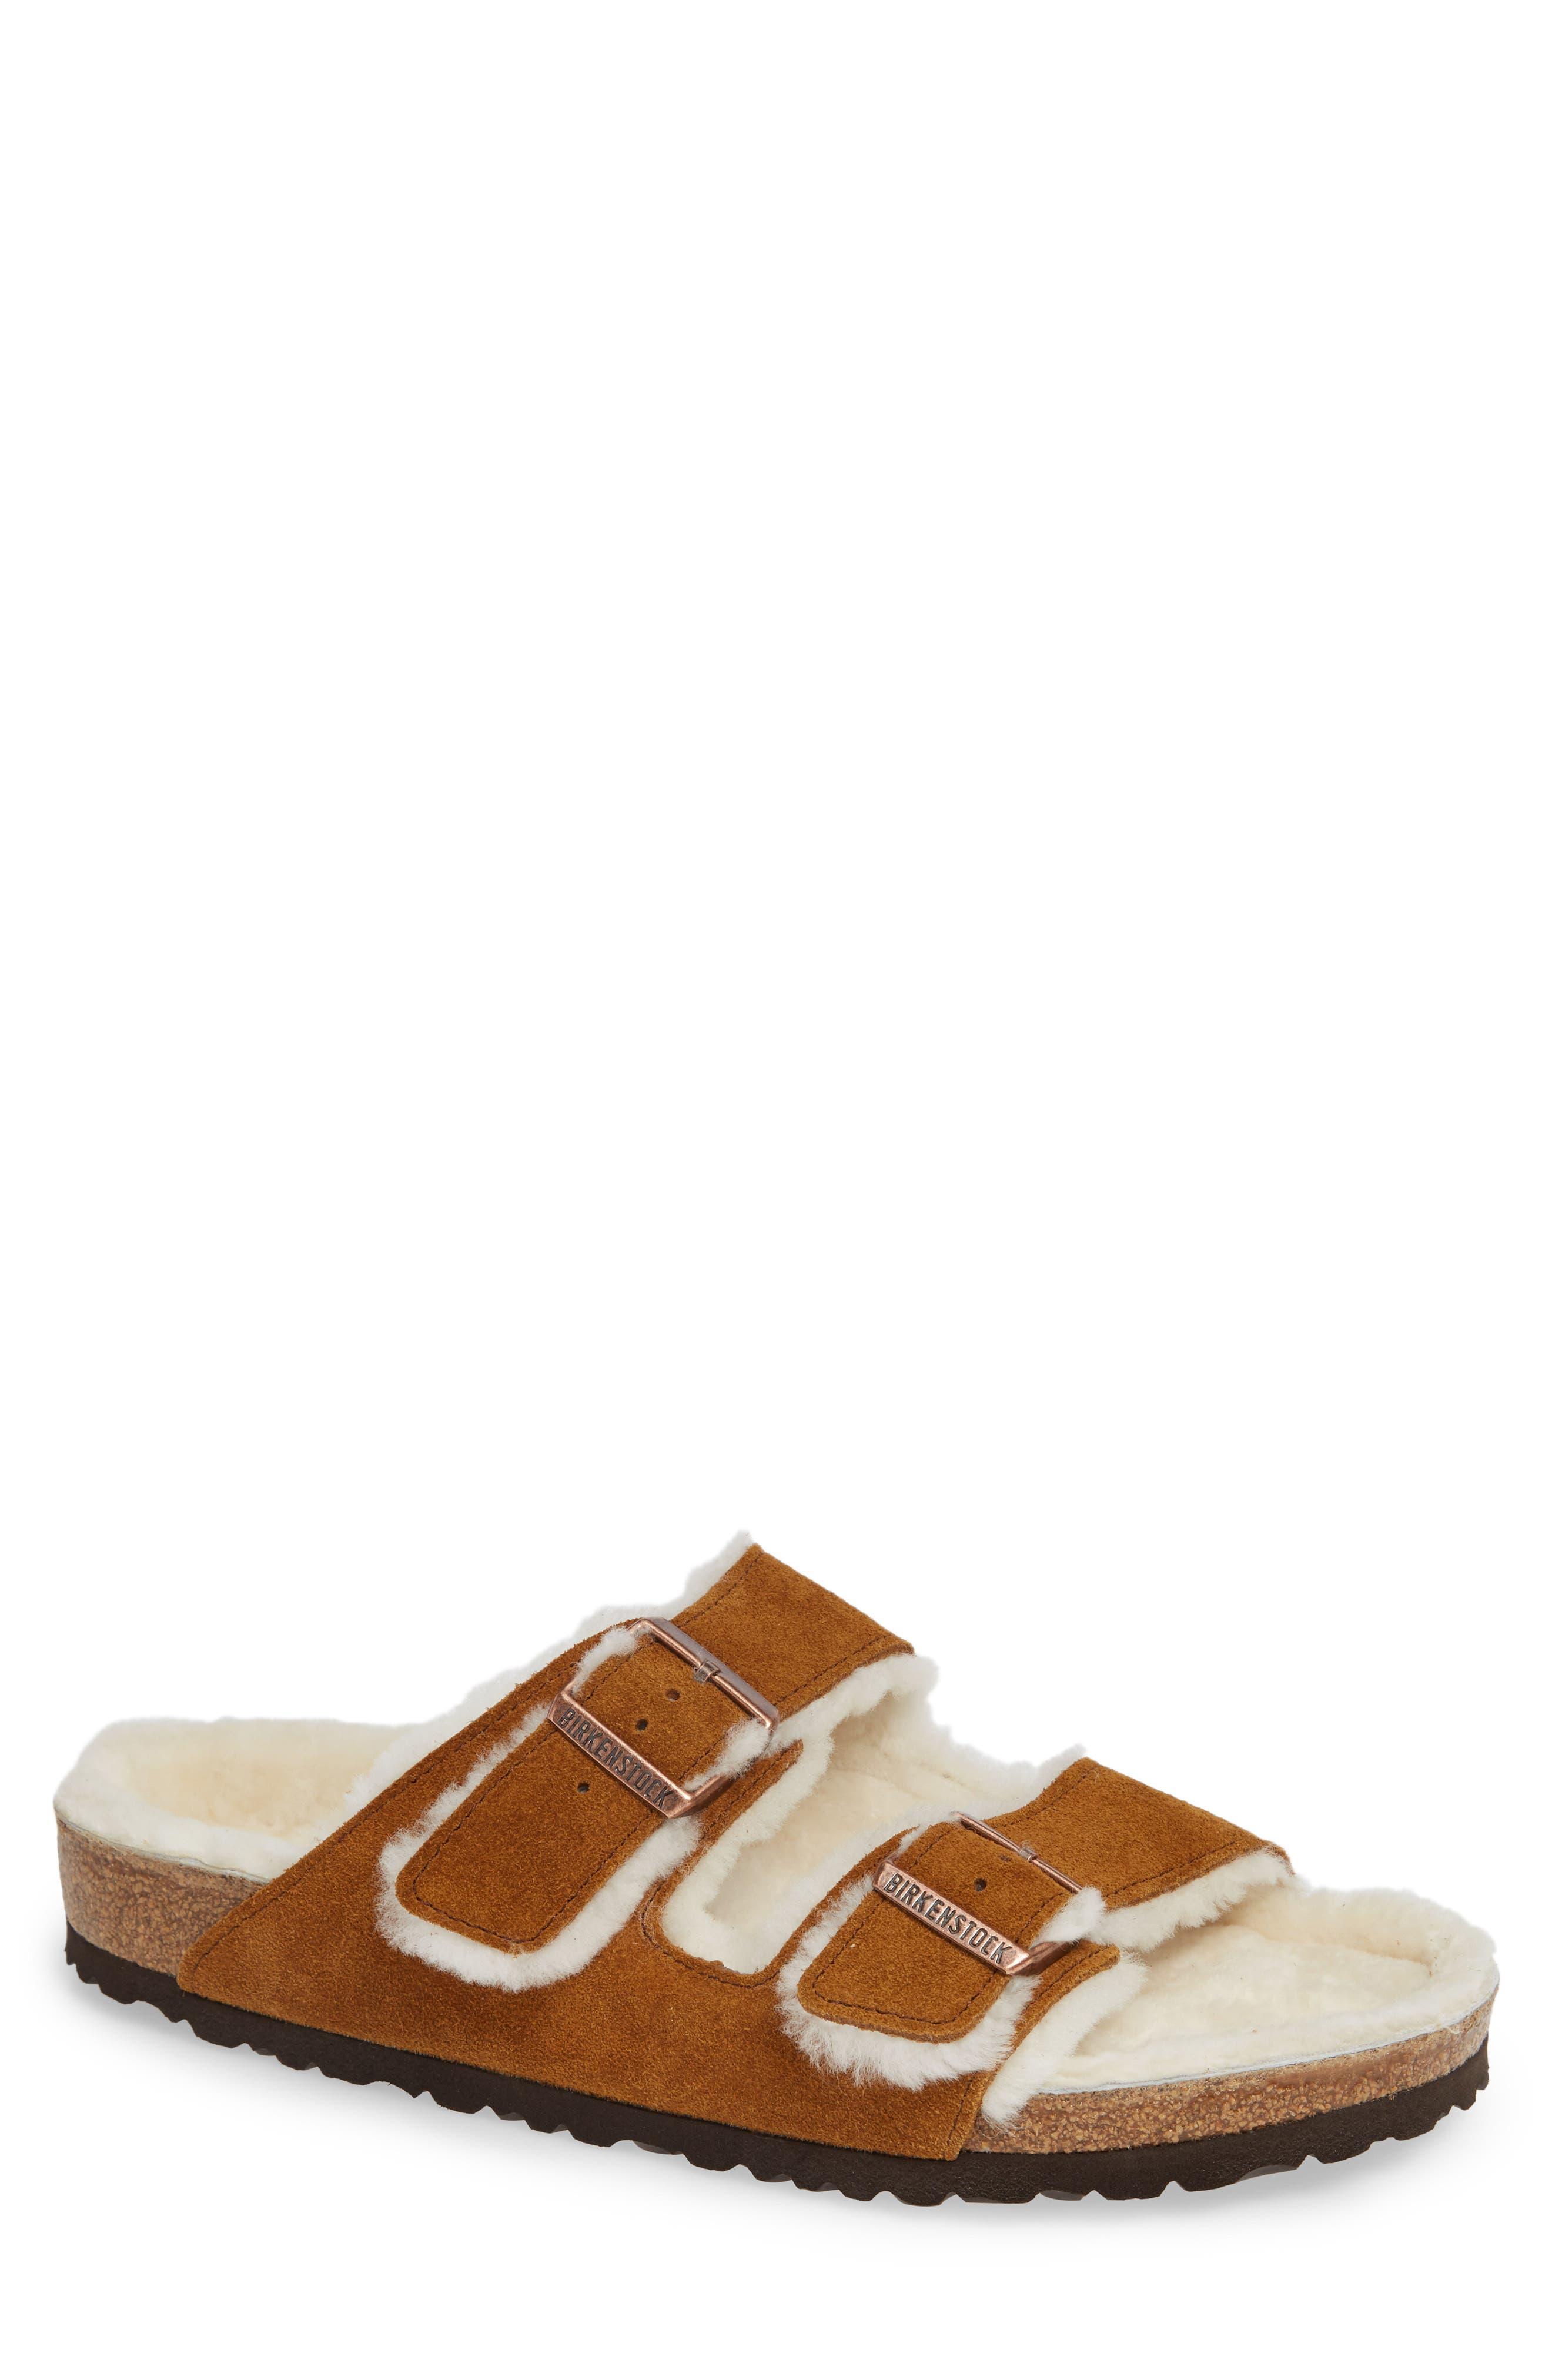 Arizona Slide Sandal with Genuine Shearling,                             Main thumbnail 1, color,                             BEIGE